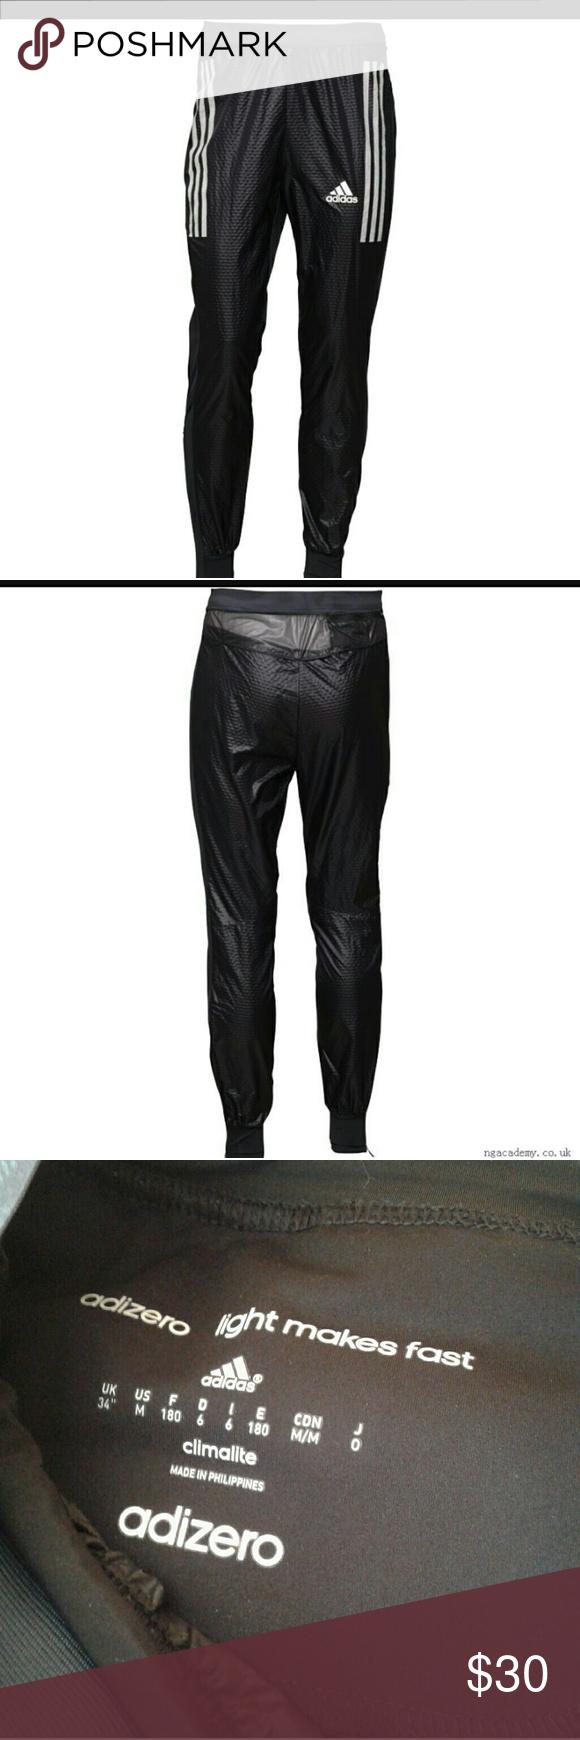 Adidas adizero climalite running pants BlackWhite Product